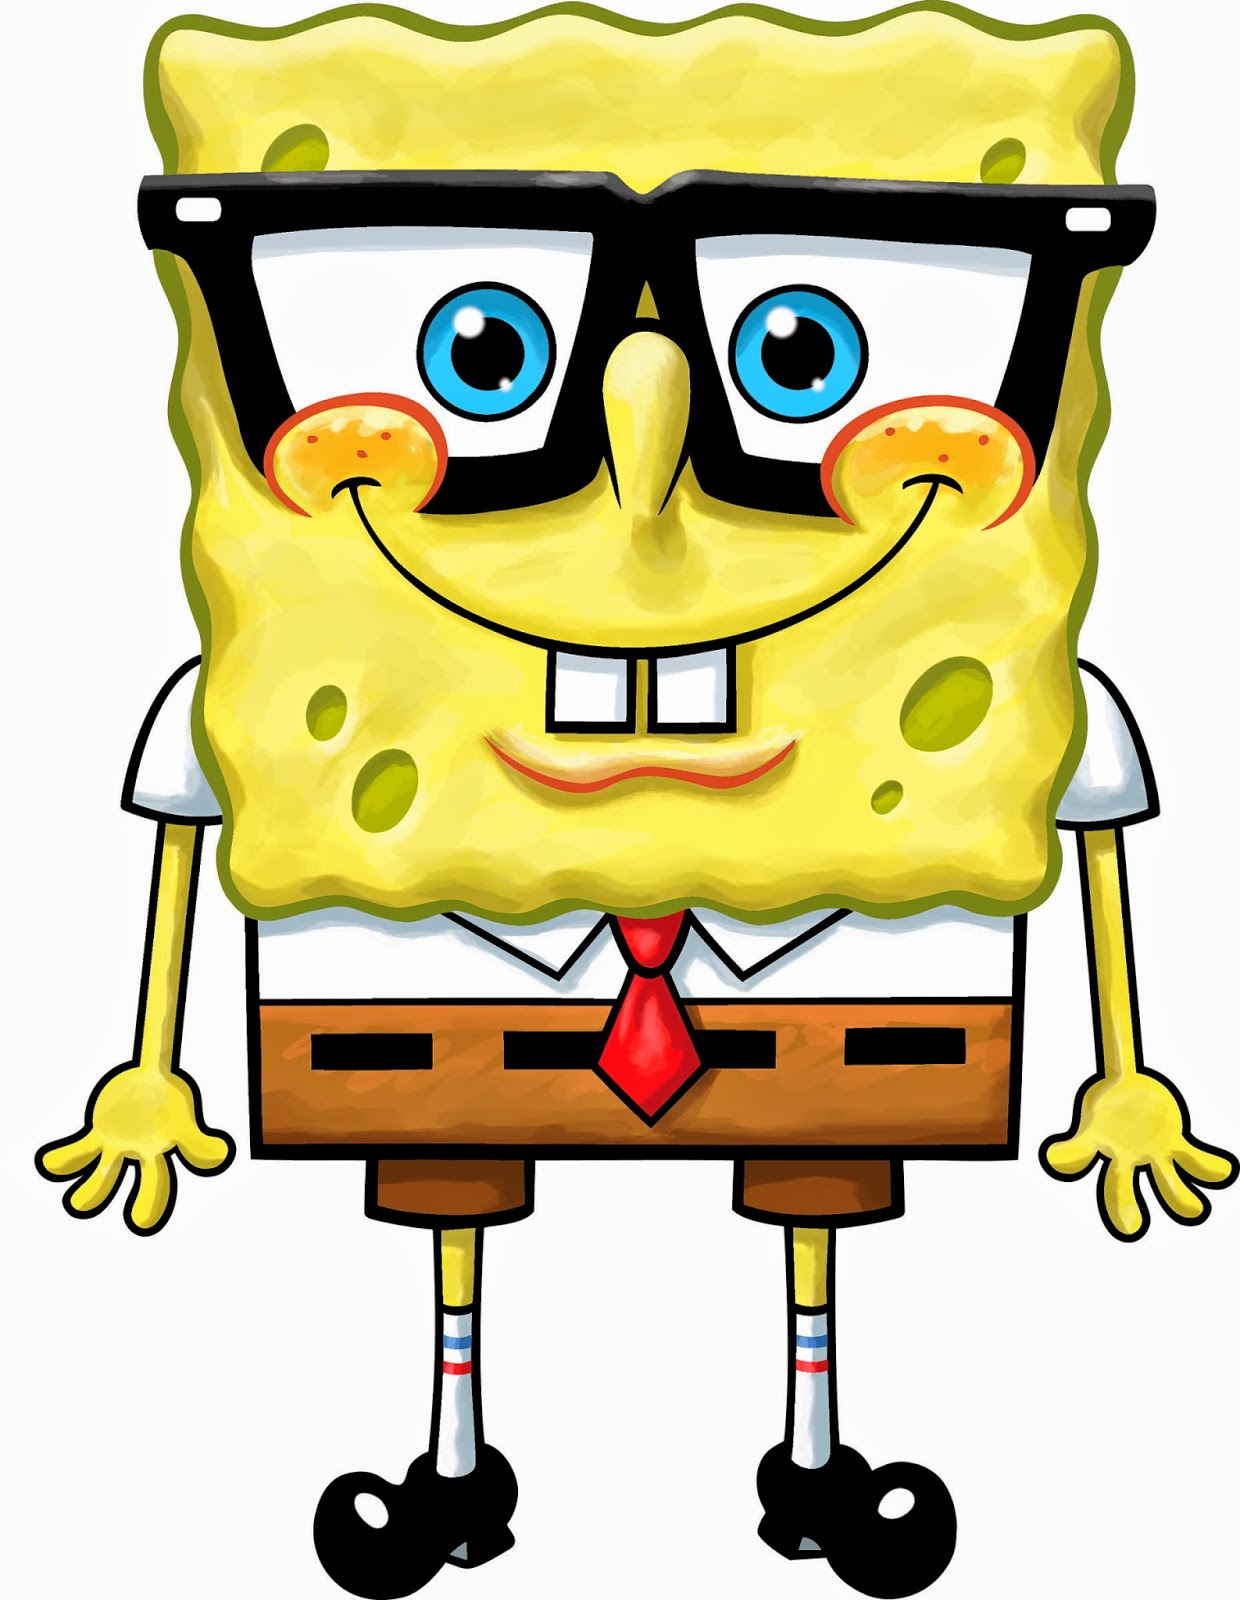 Kumpulan Gambar Spongebob Squarepants